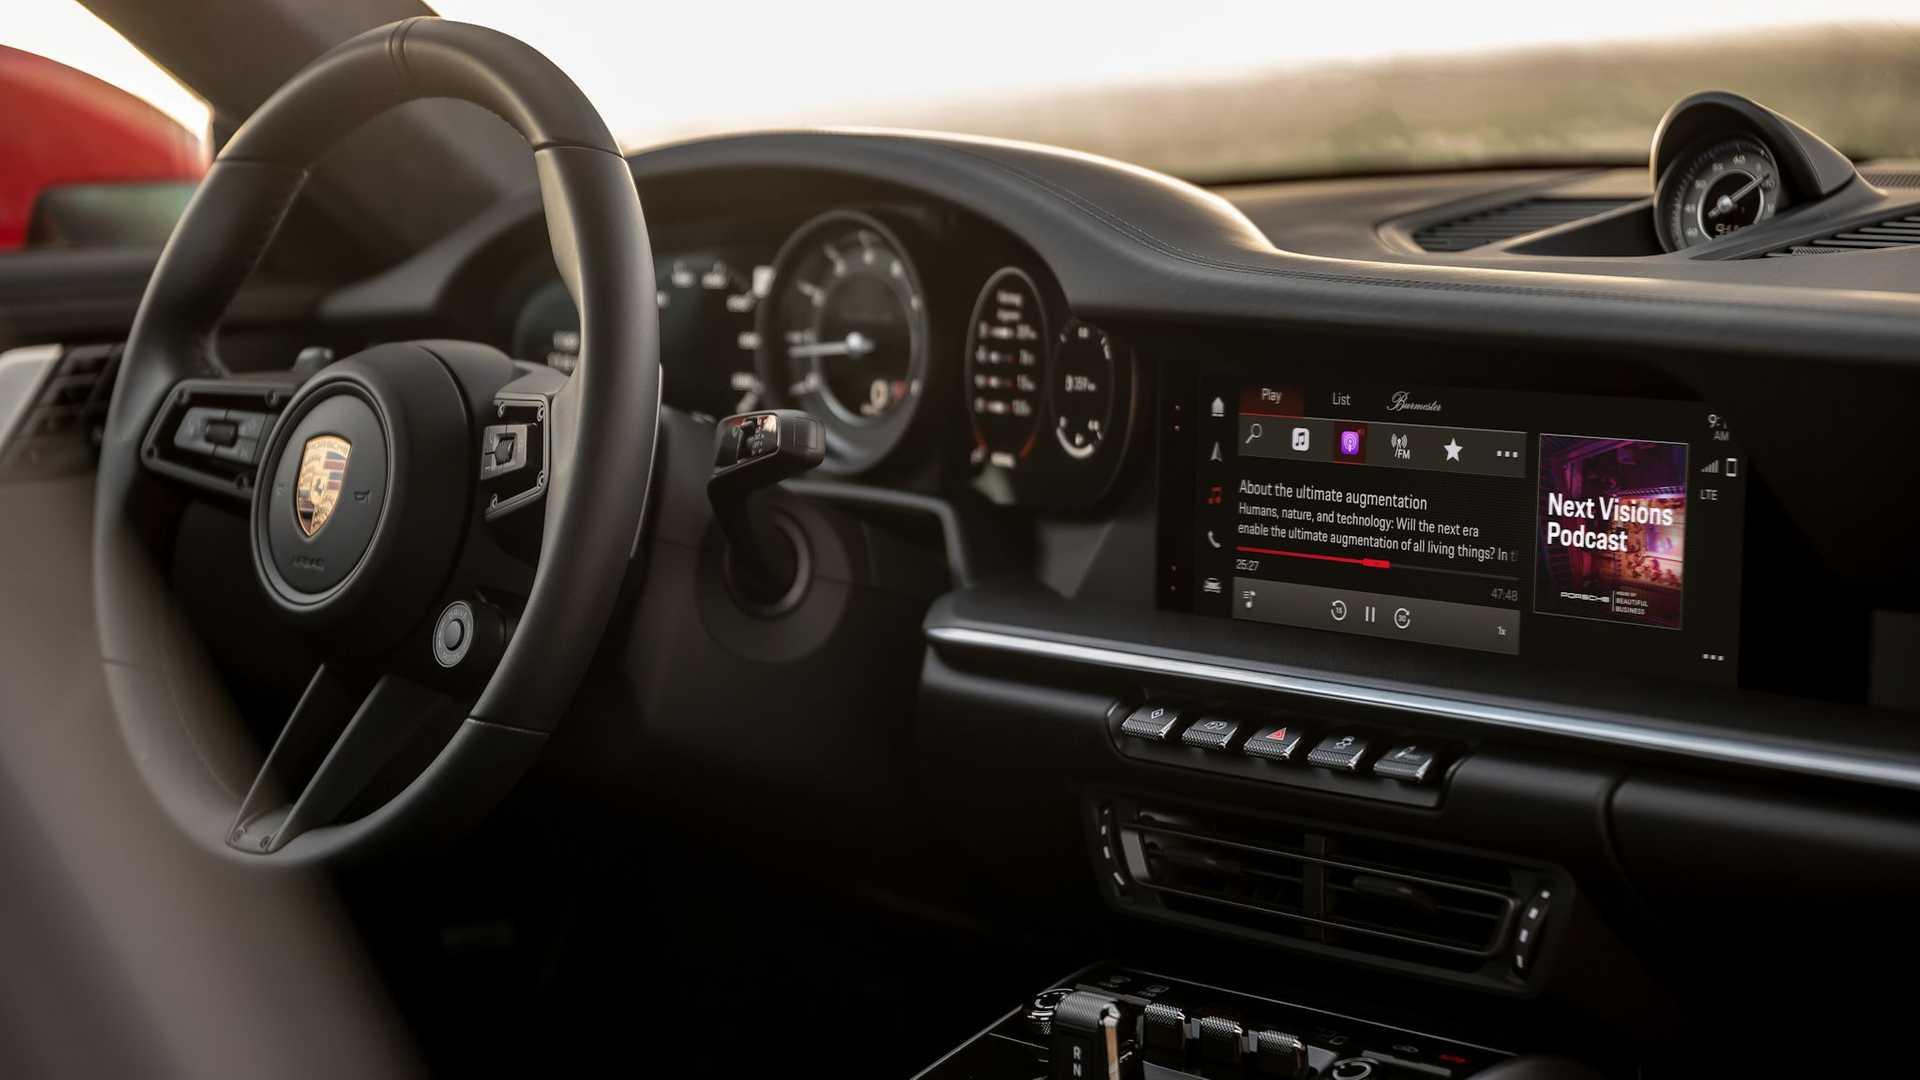 Porsche-Communication-Management-6-2